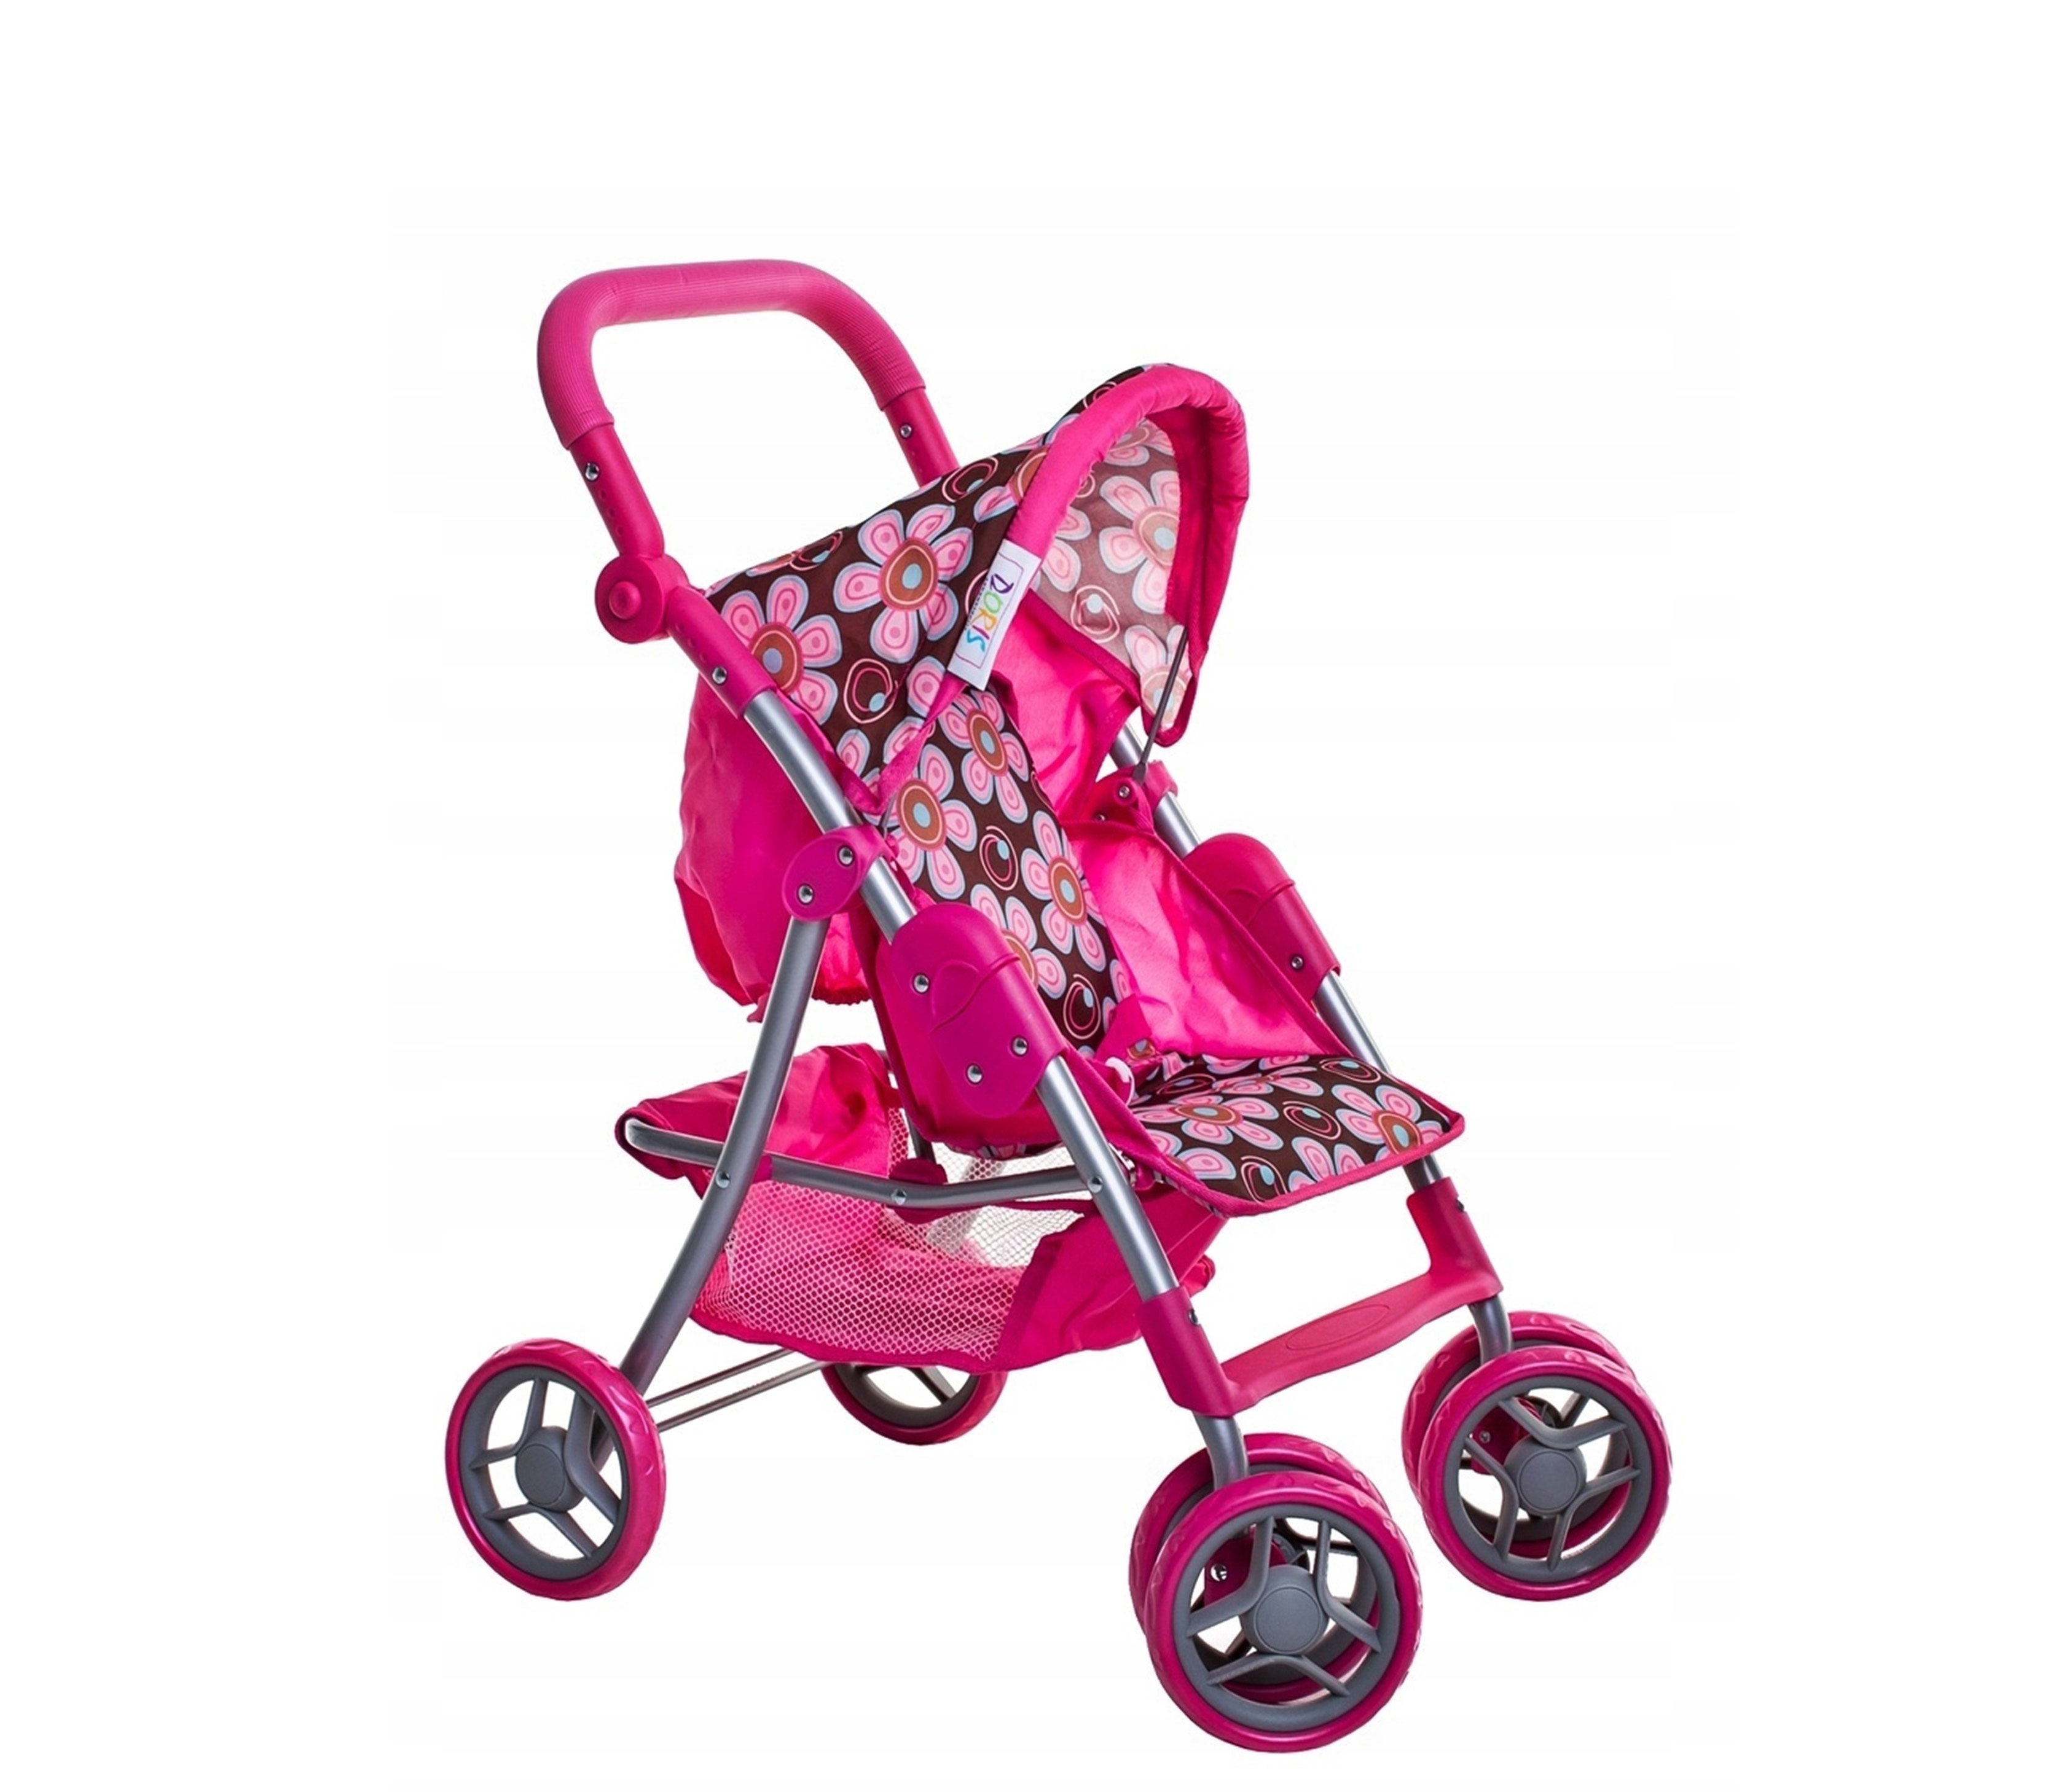 Doris Športový kočík pre bábiky 9352 Hot Pink 3